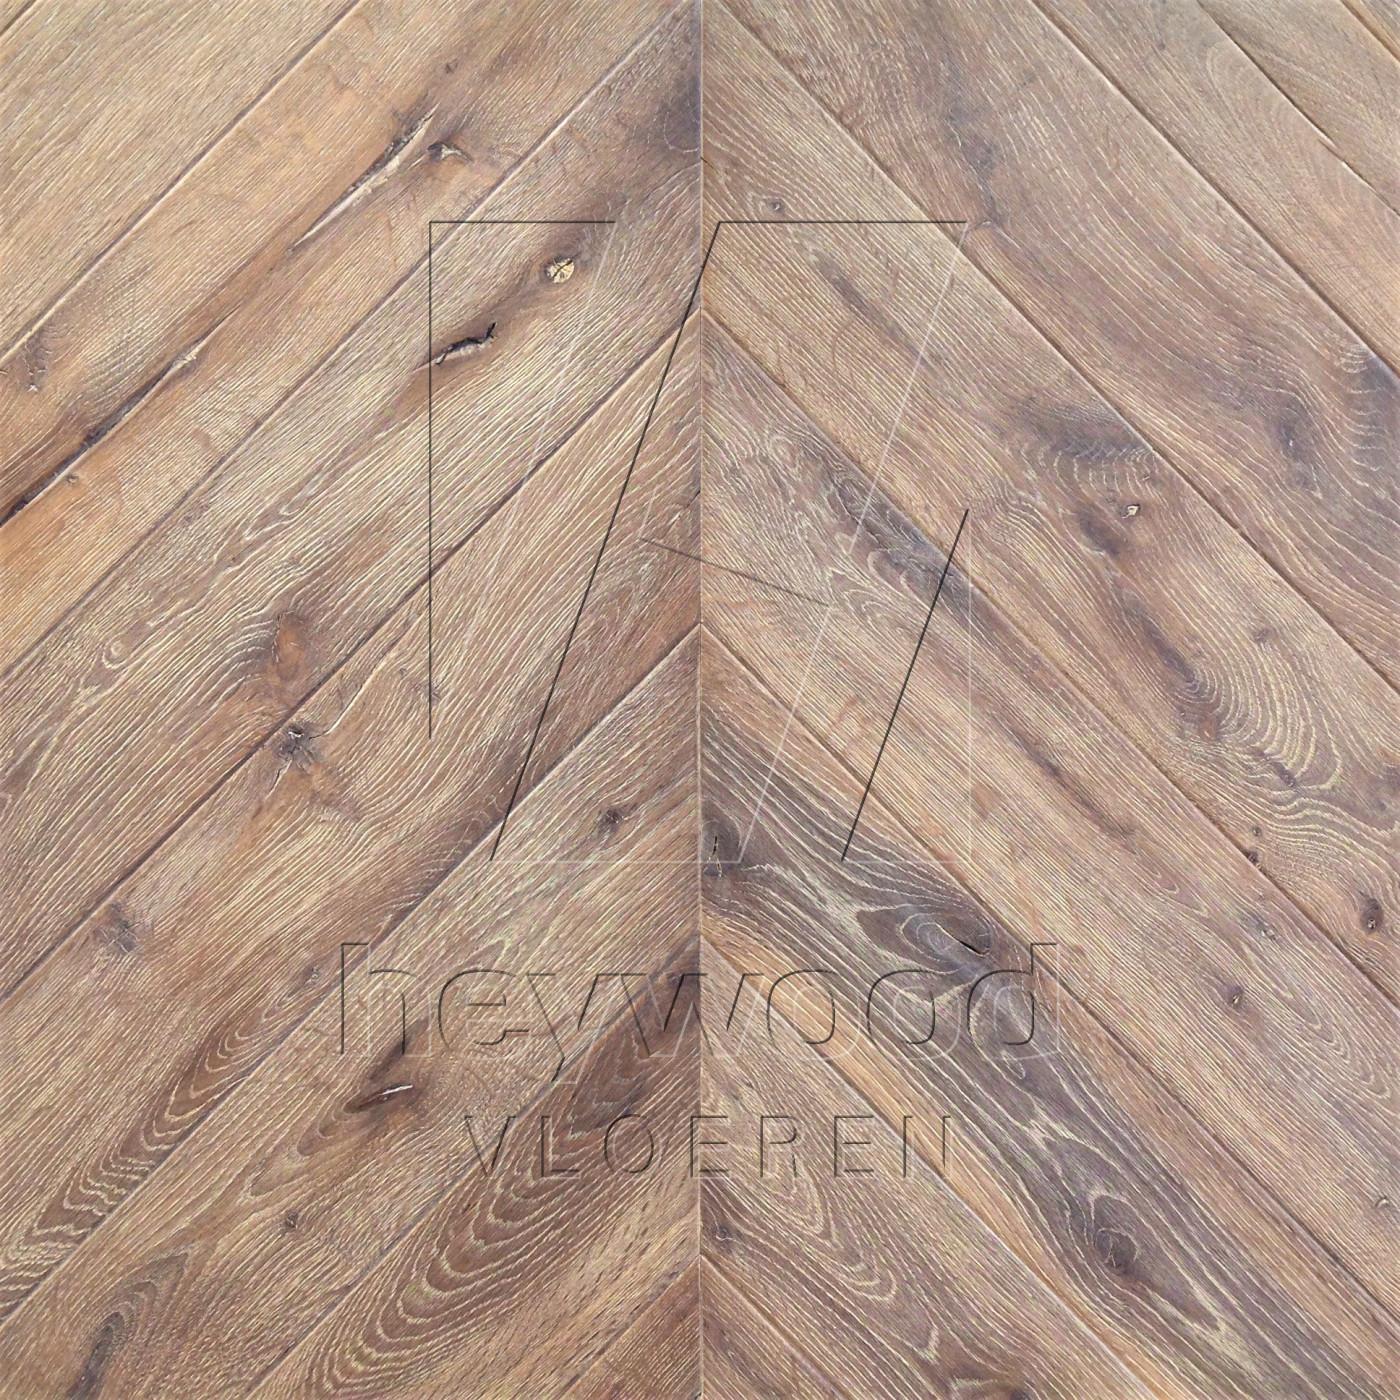 Antique Chevron 'Cerro Torre' in Chevron of Pattern & Panel Floors